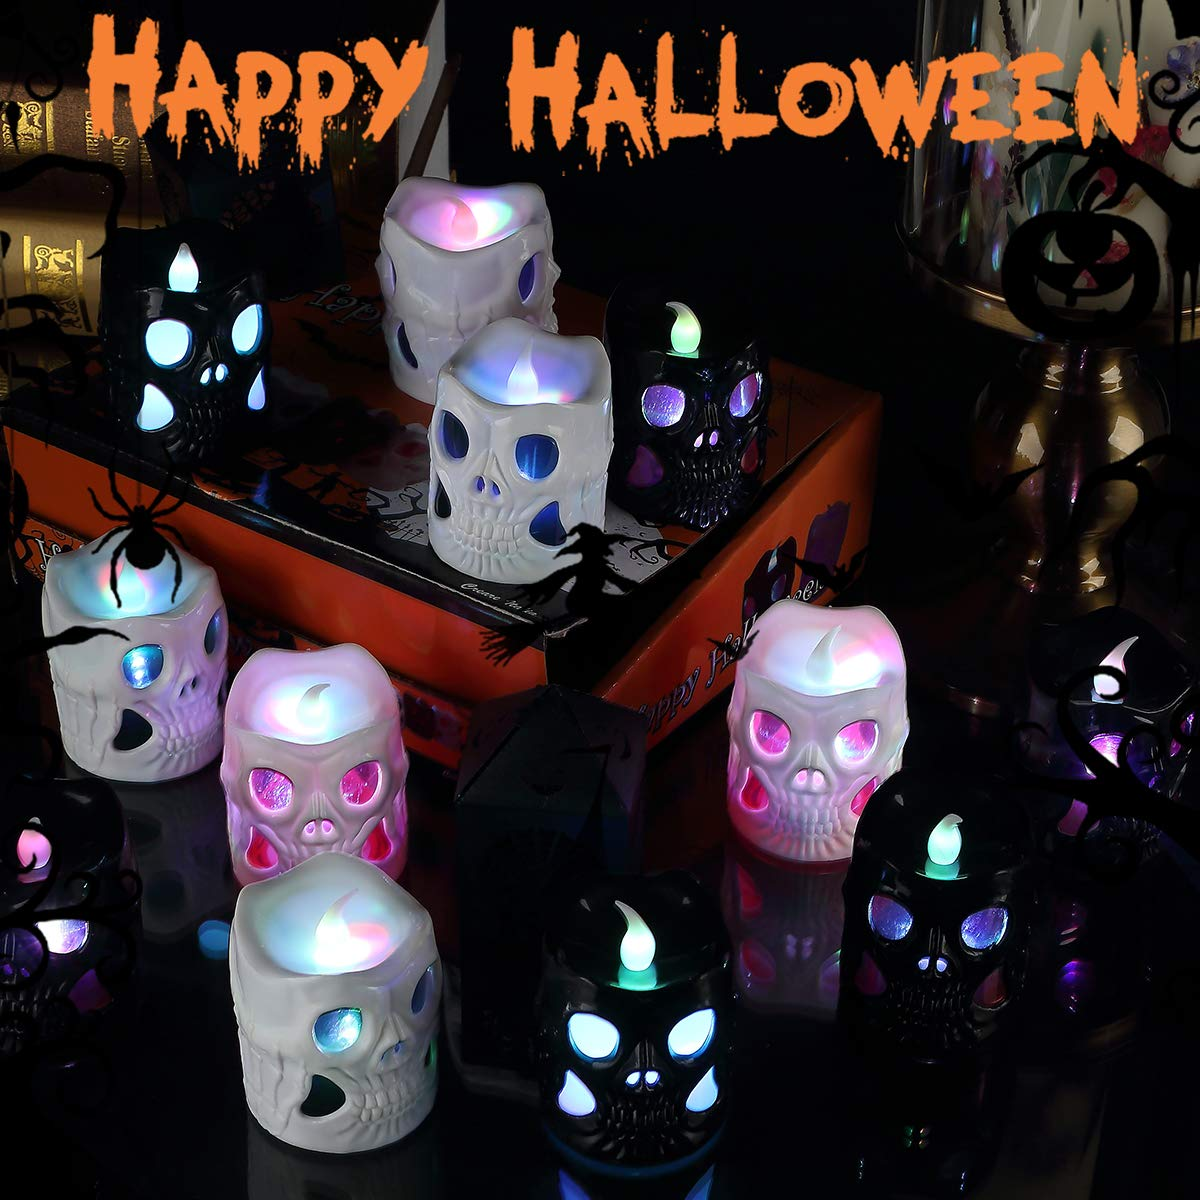 Halloween Skeleton Lights LED Battery Powered Halloween Lights Decoration Indoor Outdoor Home Garden Party(12 Pack)